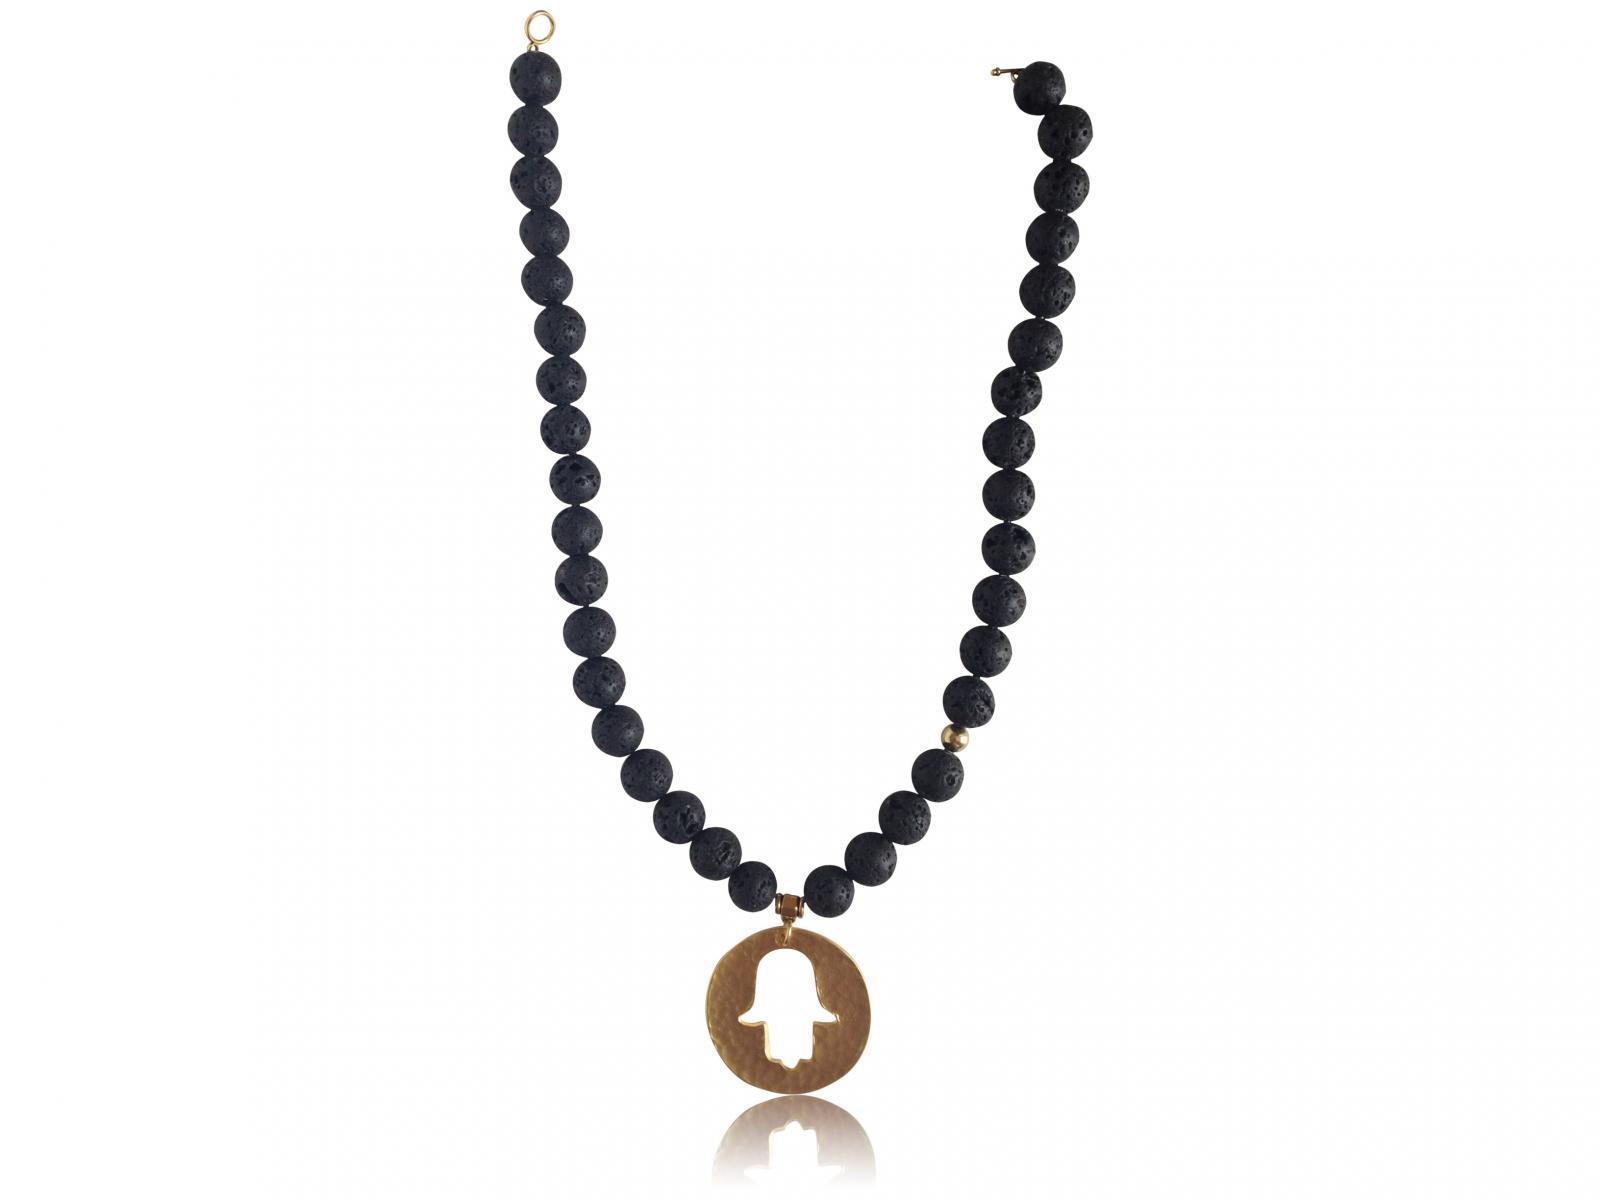 Black Lava Stone Hamsa Pendant Aromatherapy Necklace